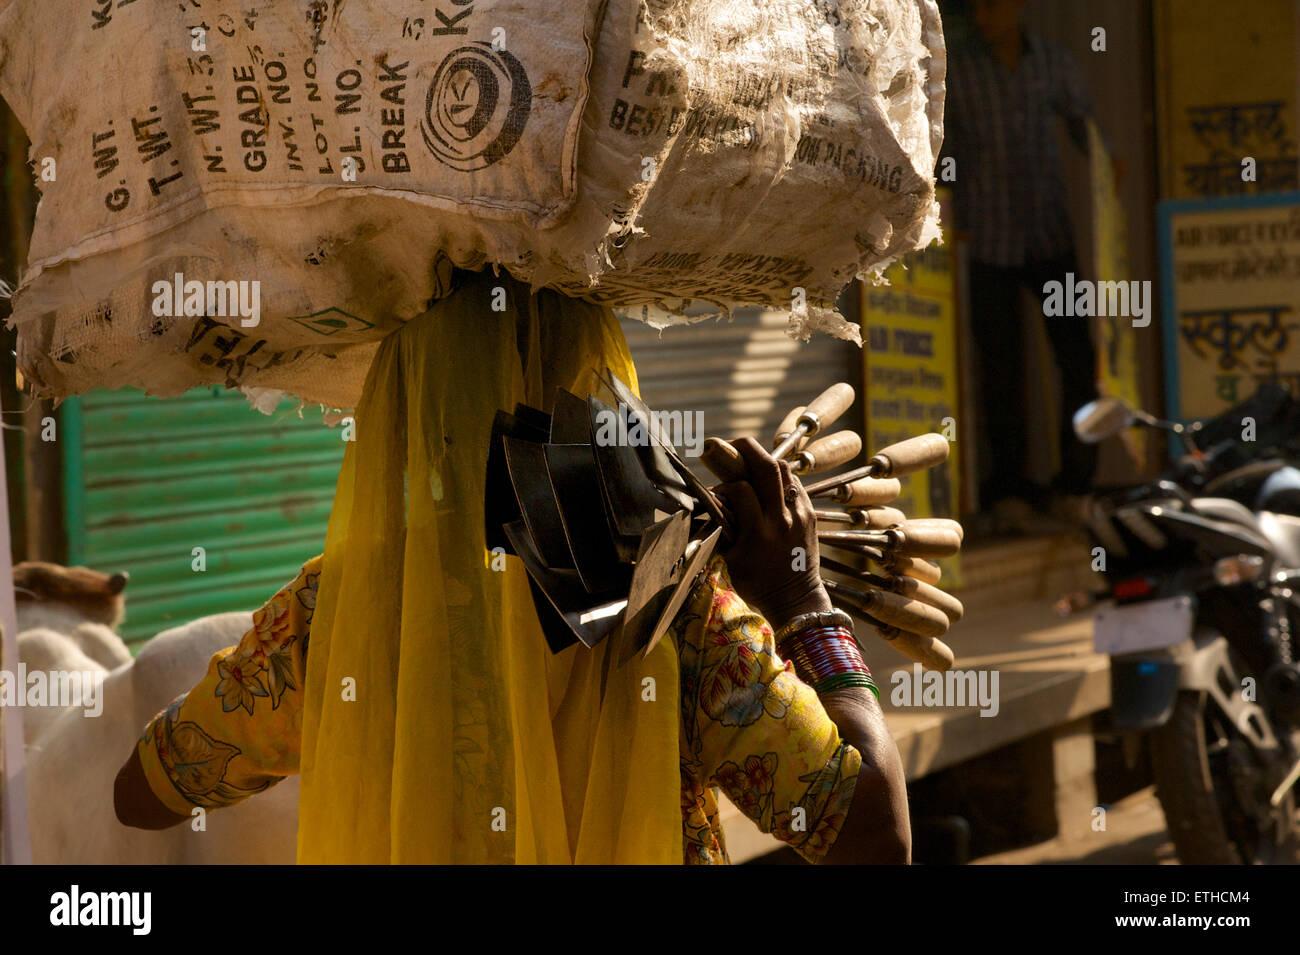 Indian woman in sari carrying goods at market, Jaisalmer, Rajasthan, India - Stock Image